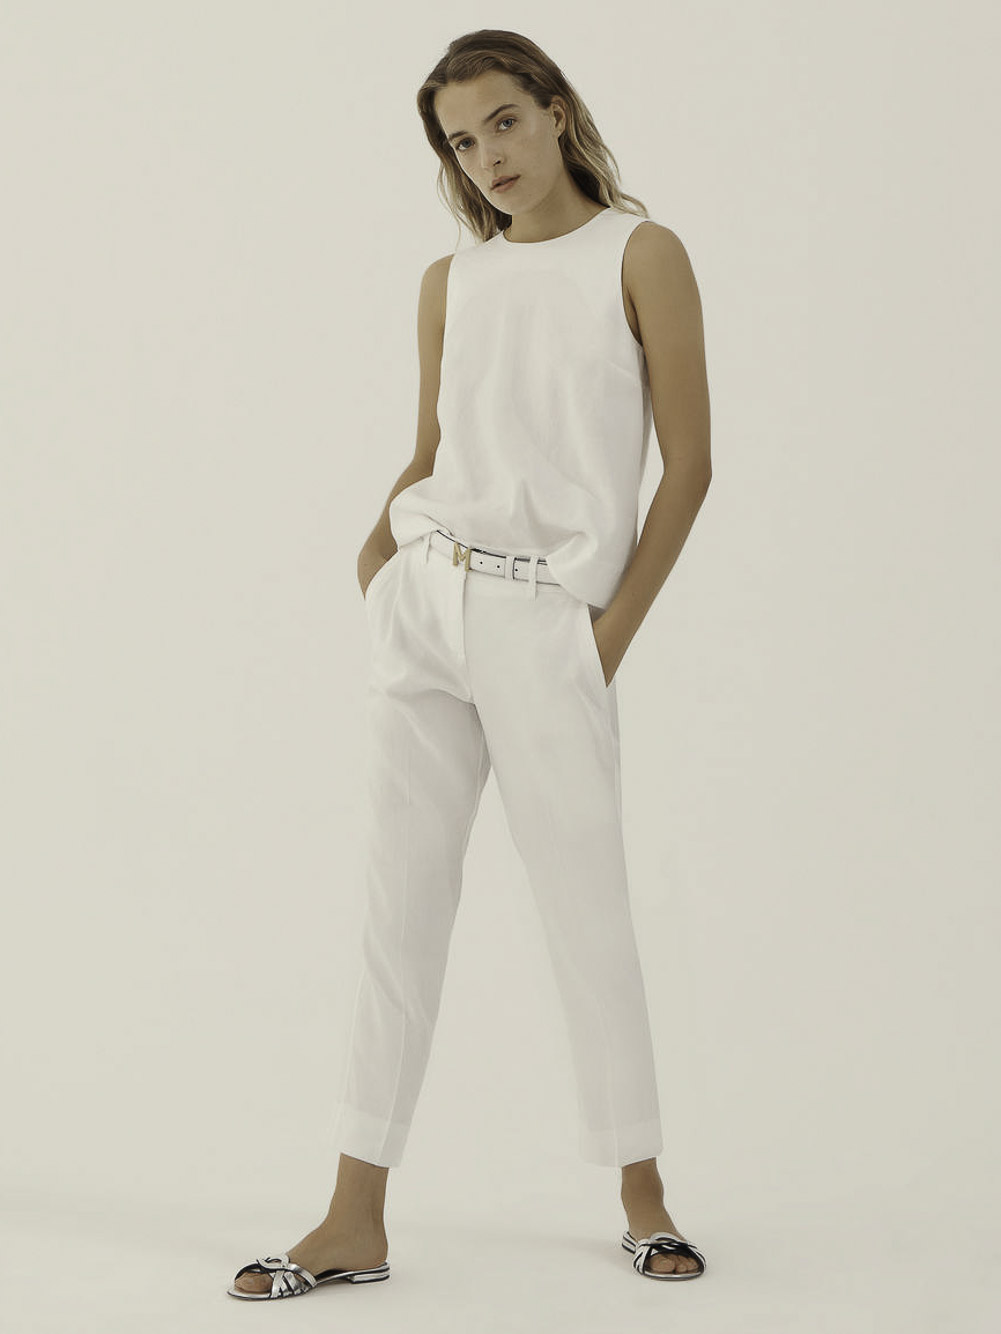 Marella Μπλούα t-shirt GROUP 31610215 WHITE